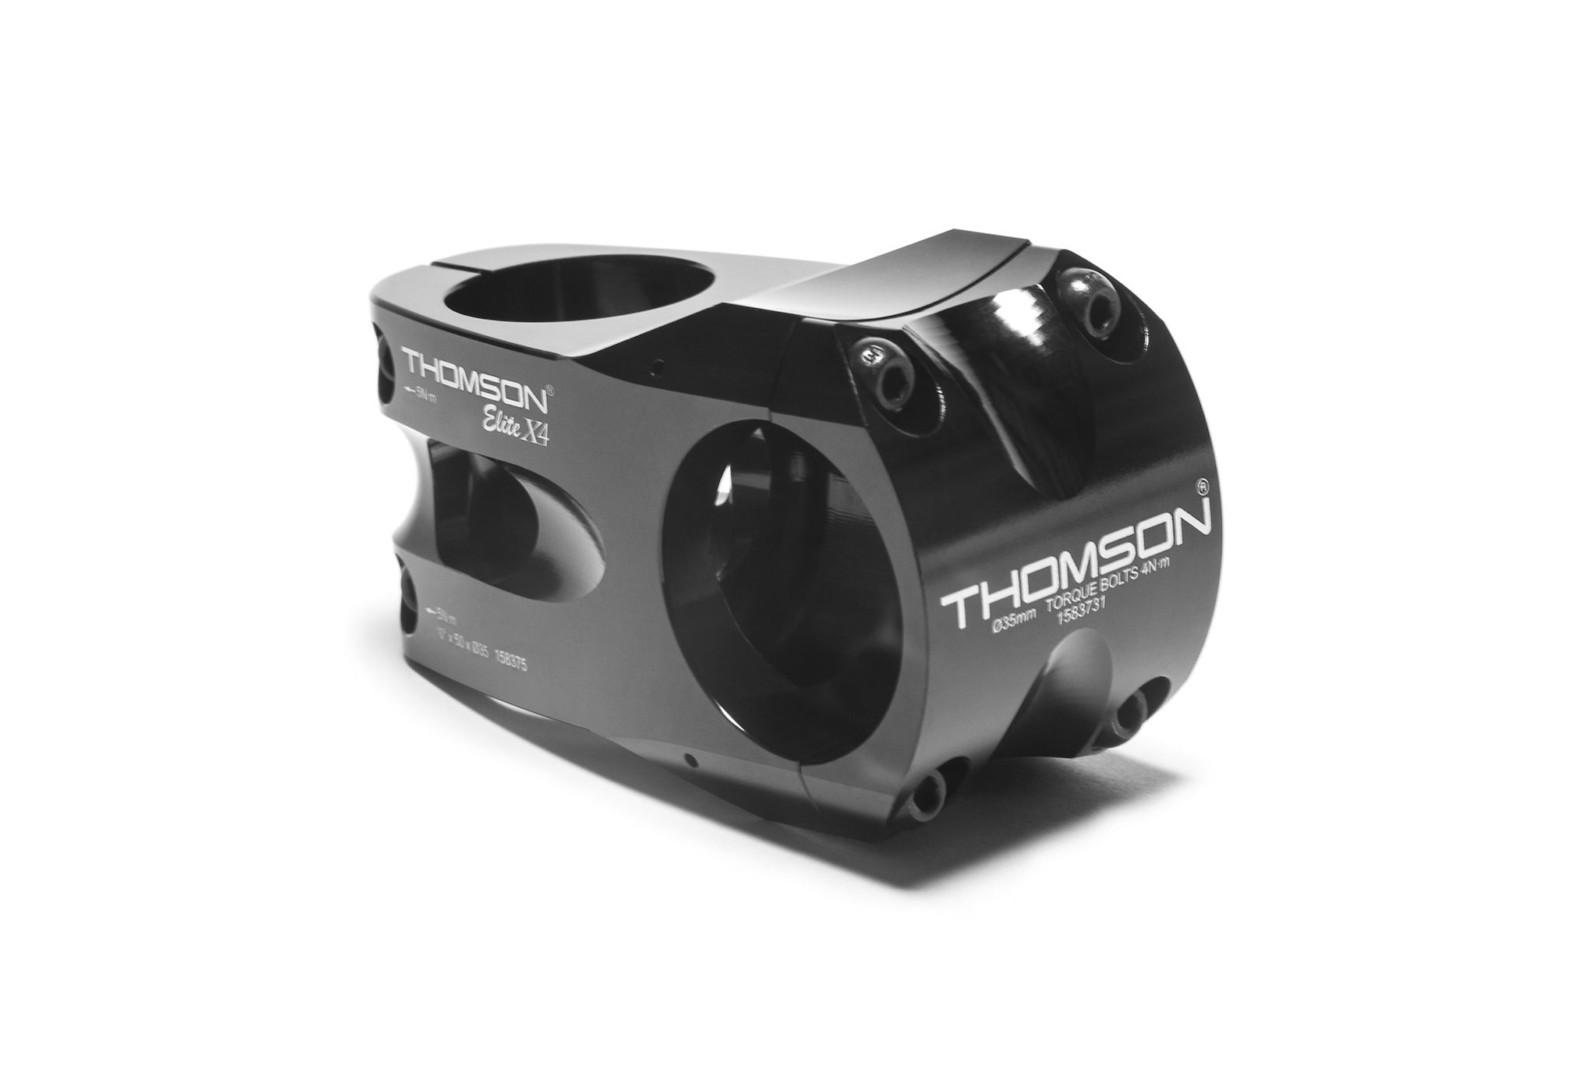 Thomson X4 35 (50mm)